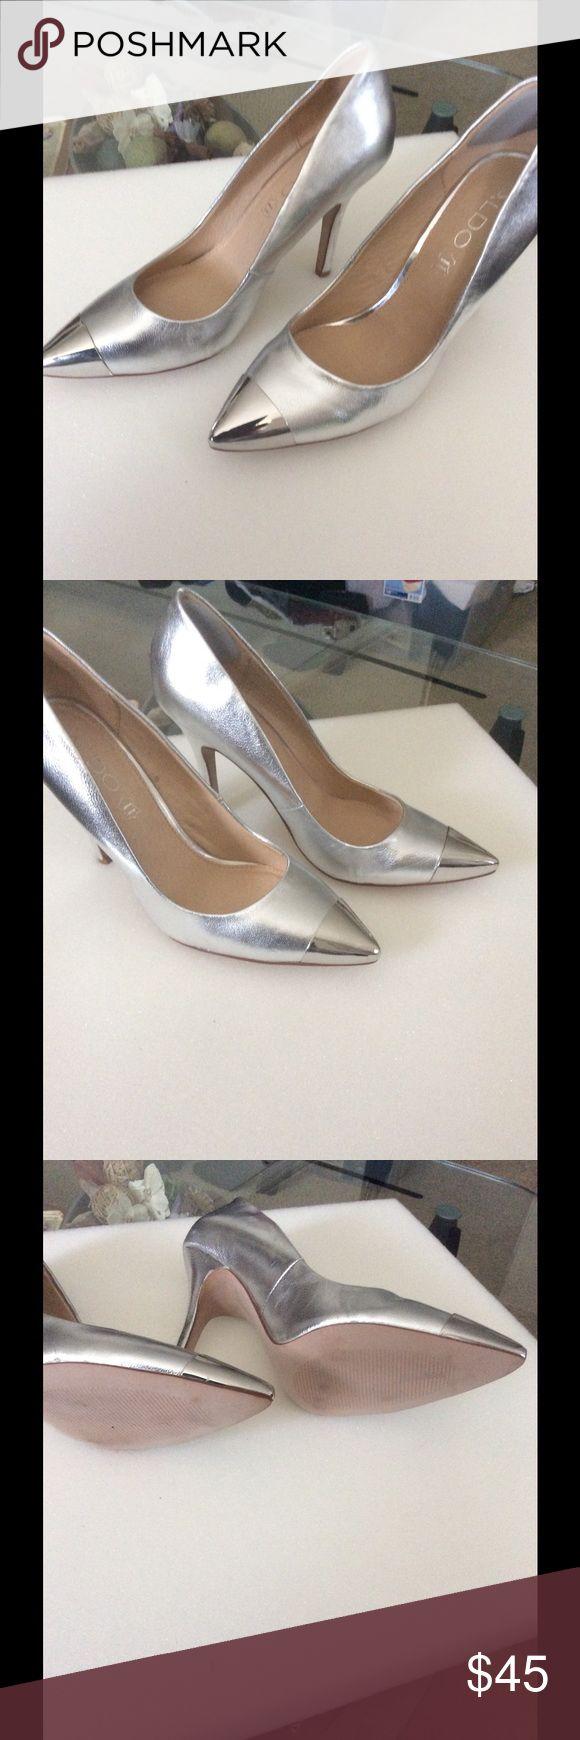 Womens Aldo pumps Womens silver on silver pump Aldo Shoes Heels